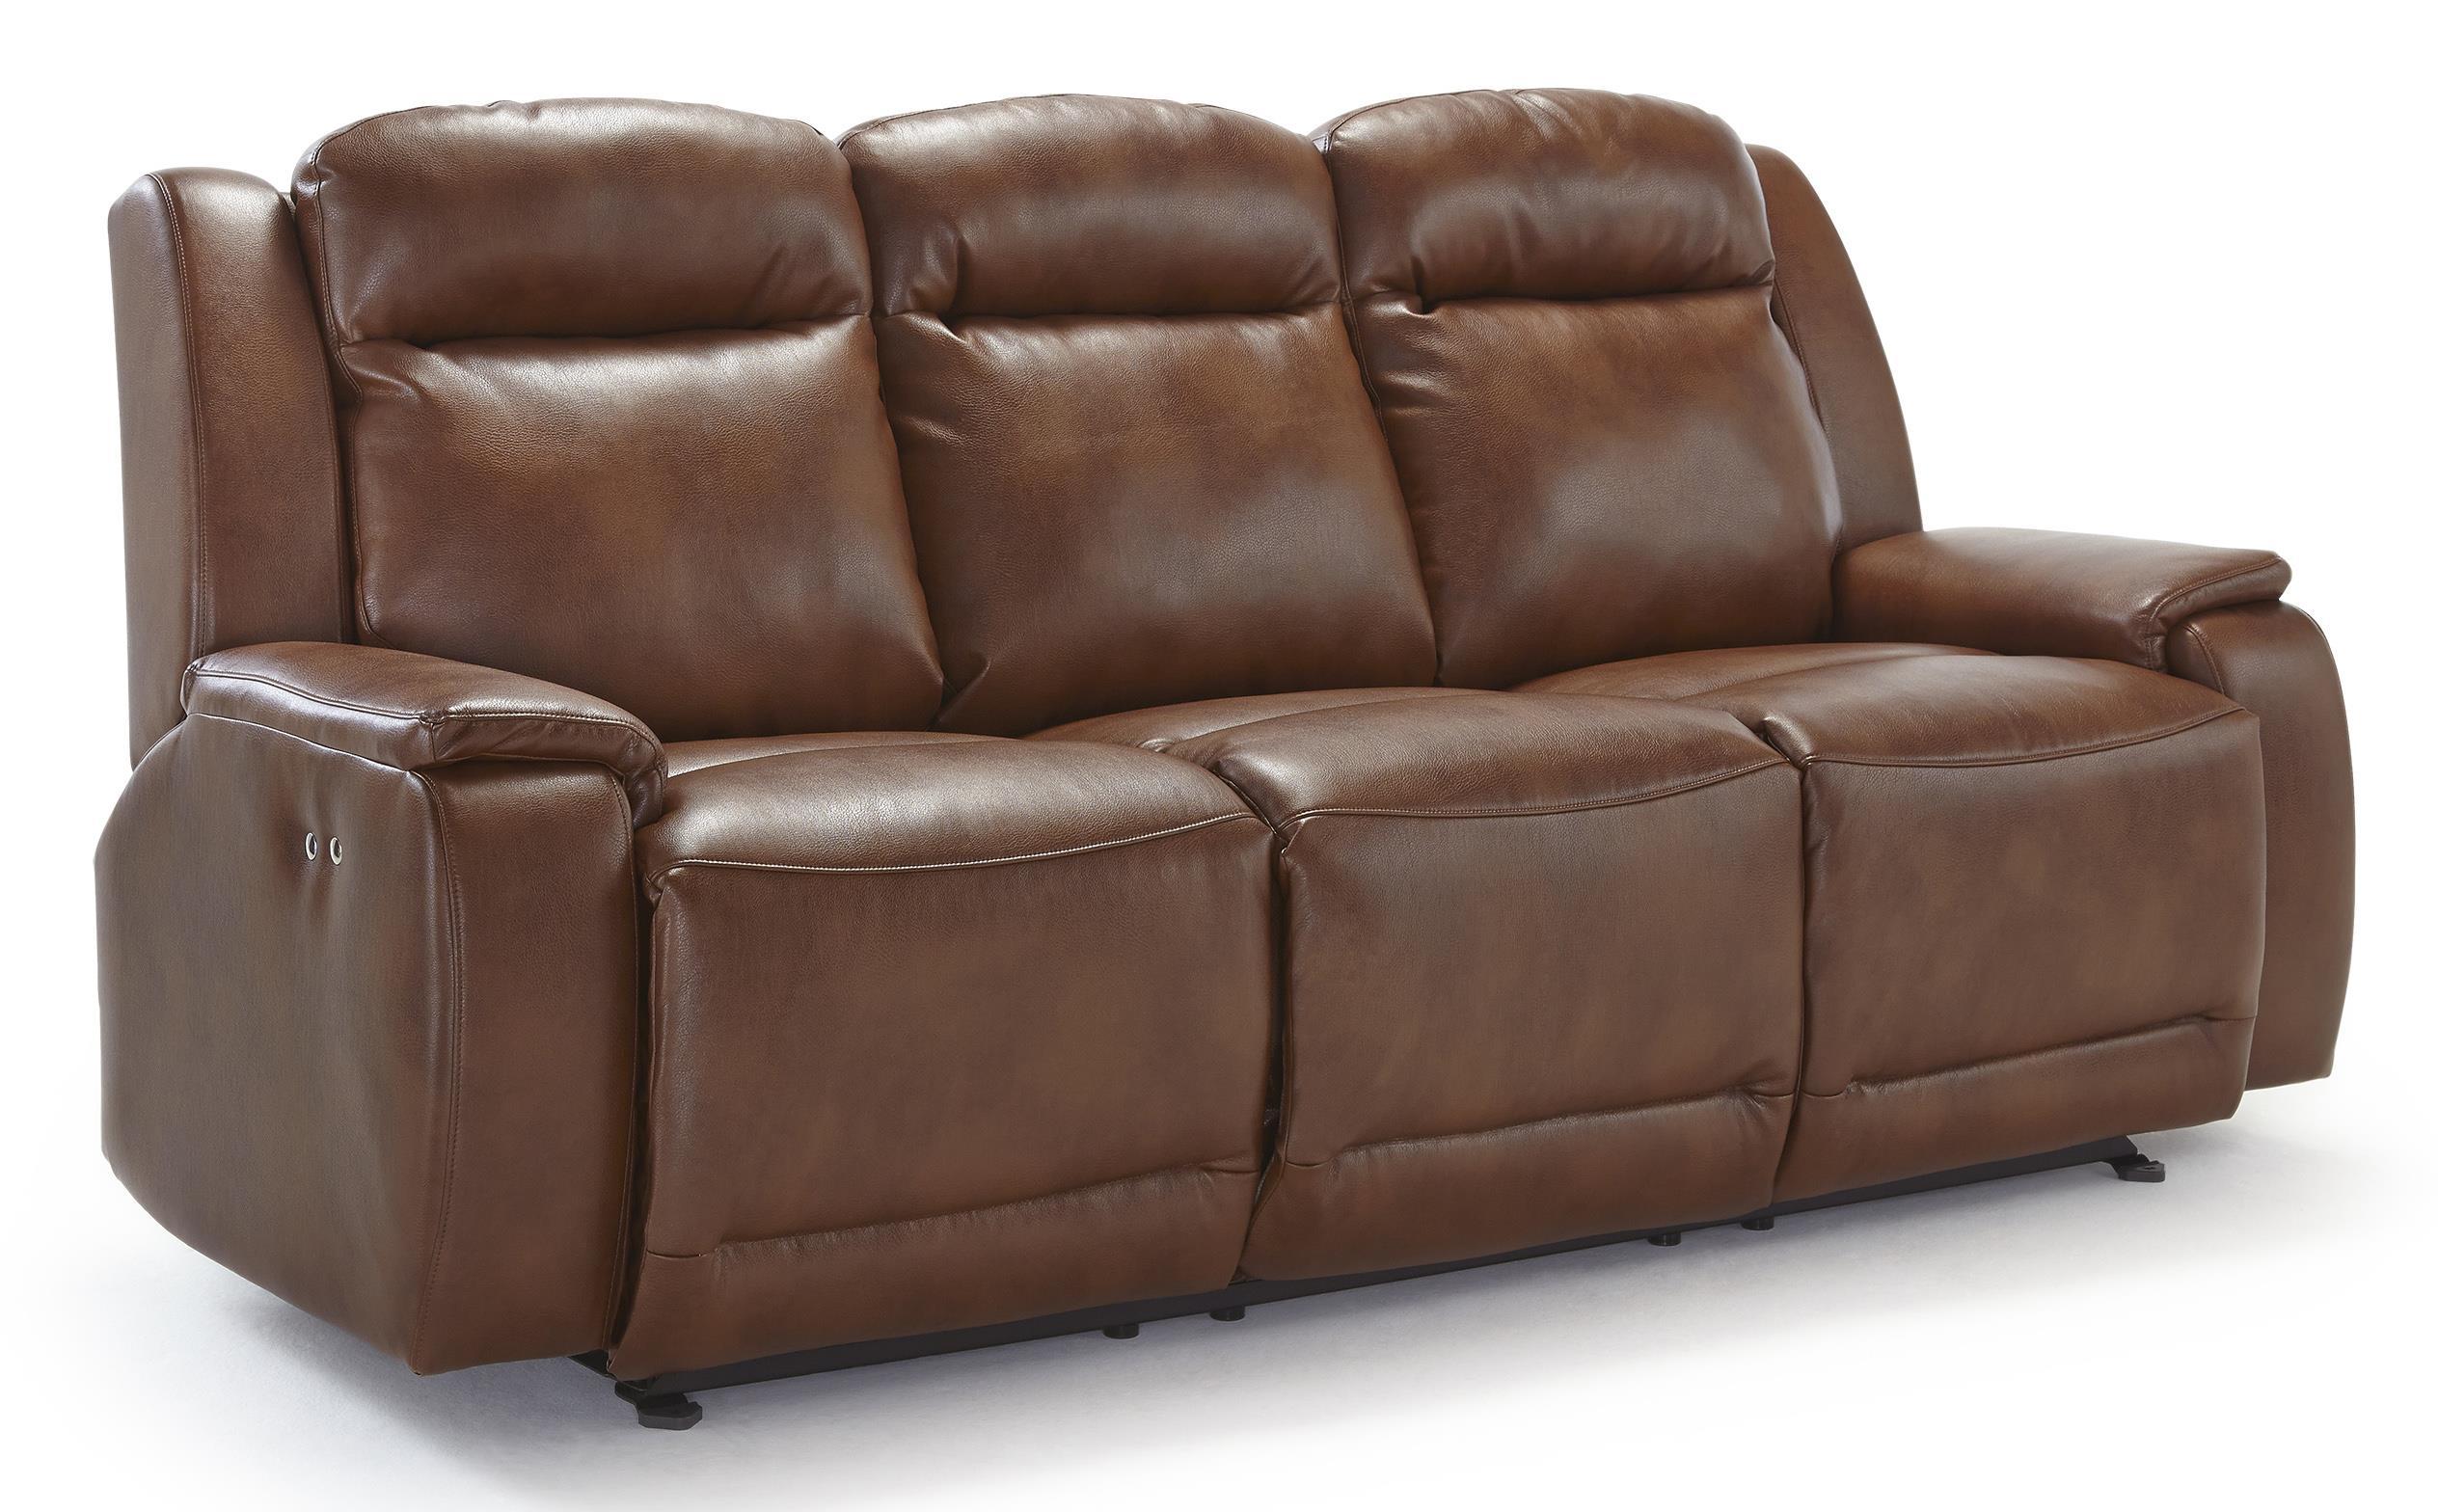 Best Home Furnishings Hardisty Reclining Sofa - Item Number: S680RA4U-26764U